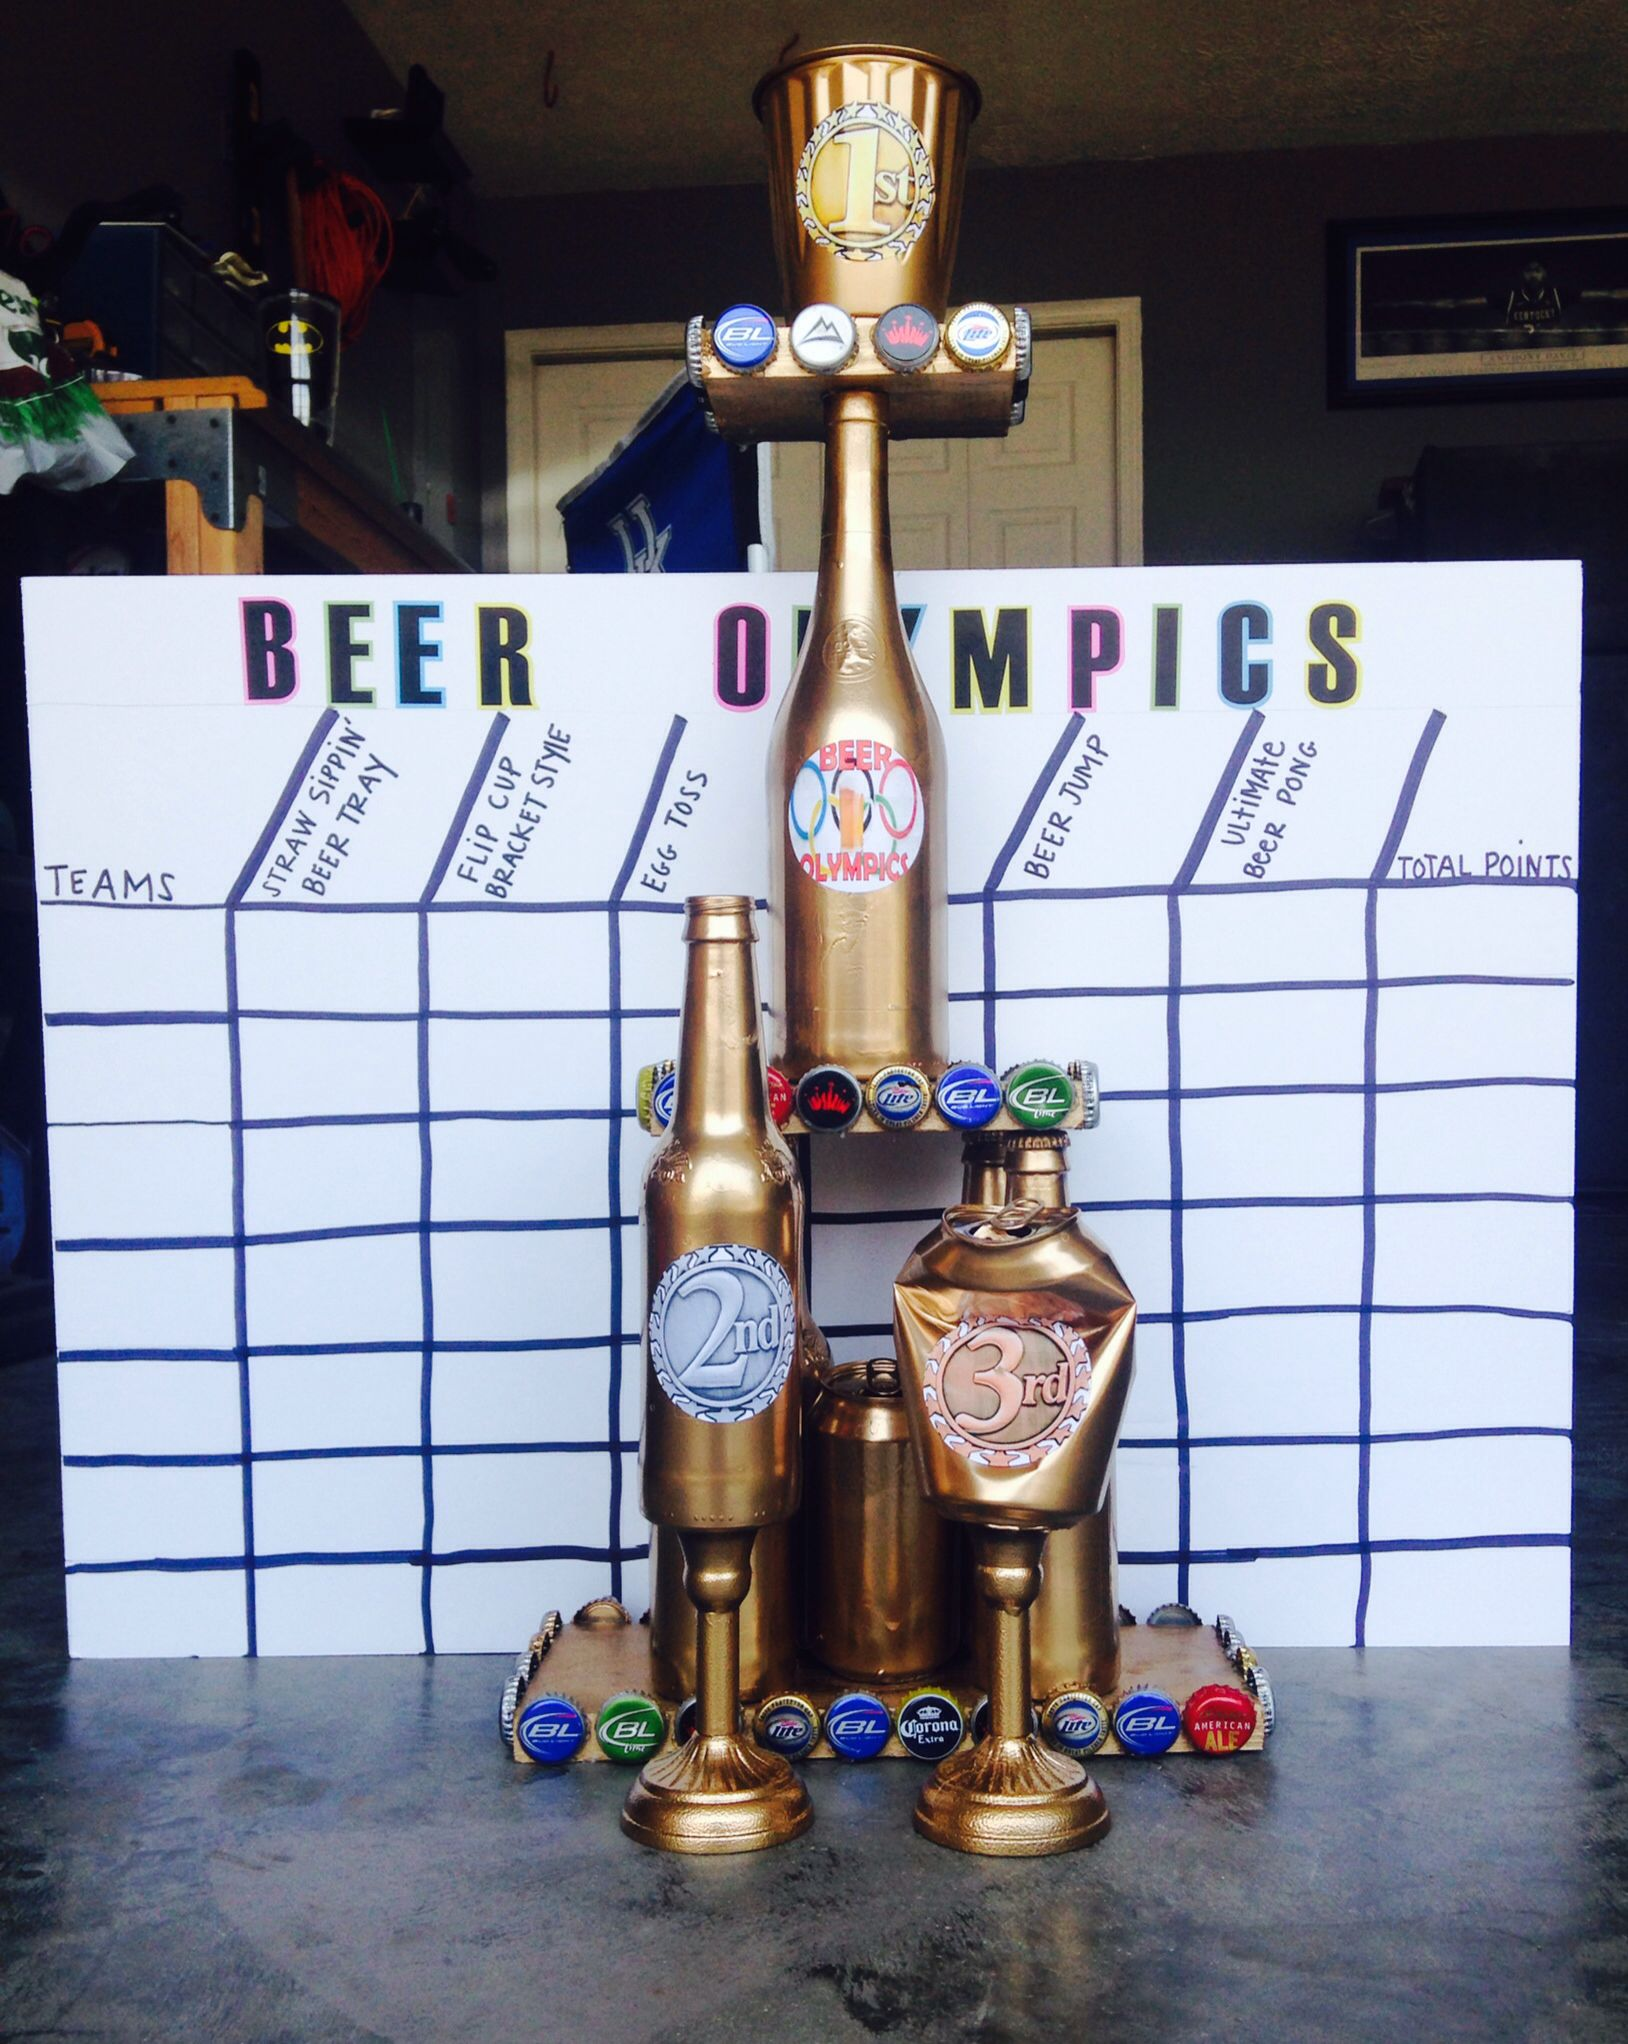 Beer Olympics Bash 2016 Beer olympic, Beer olympics